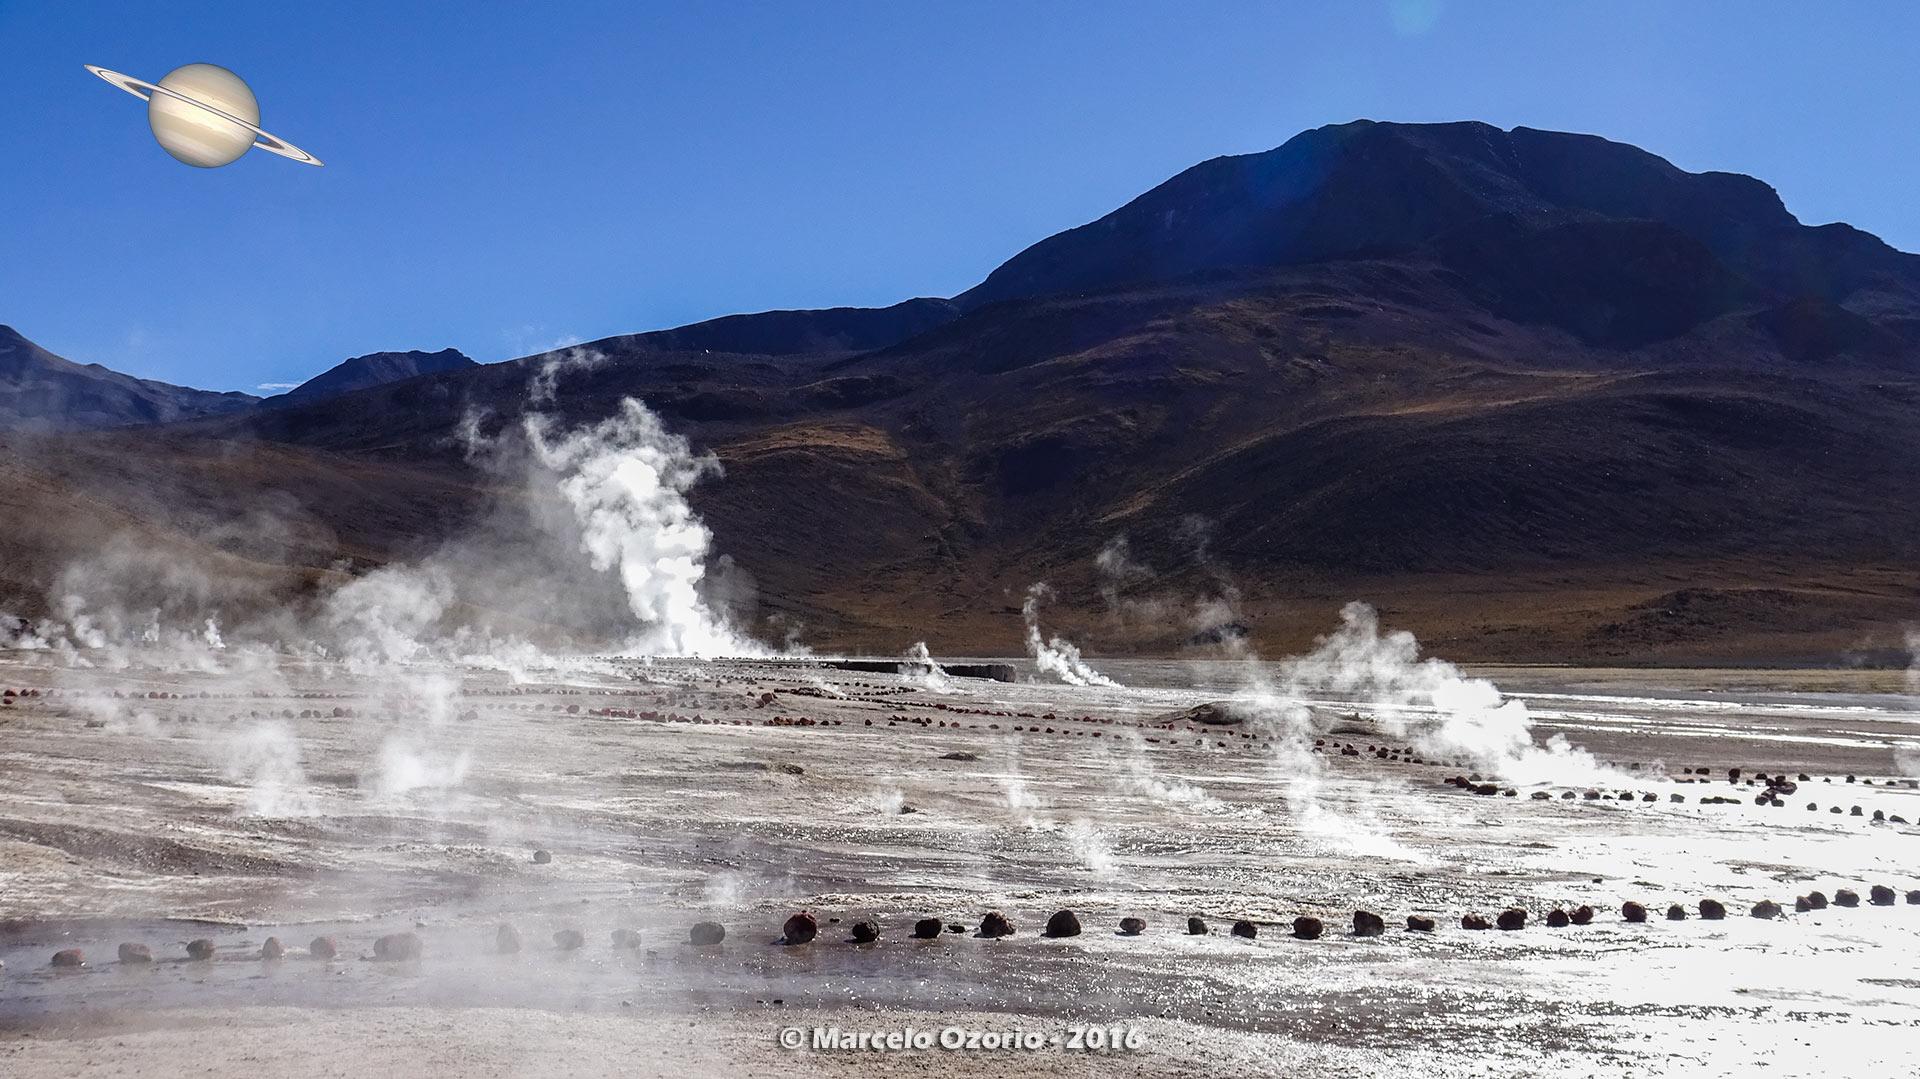 el tatio geysers atacama desert 35 - Os Surreais Gêiseres El Tatio - Deserto do Atacama - Chile